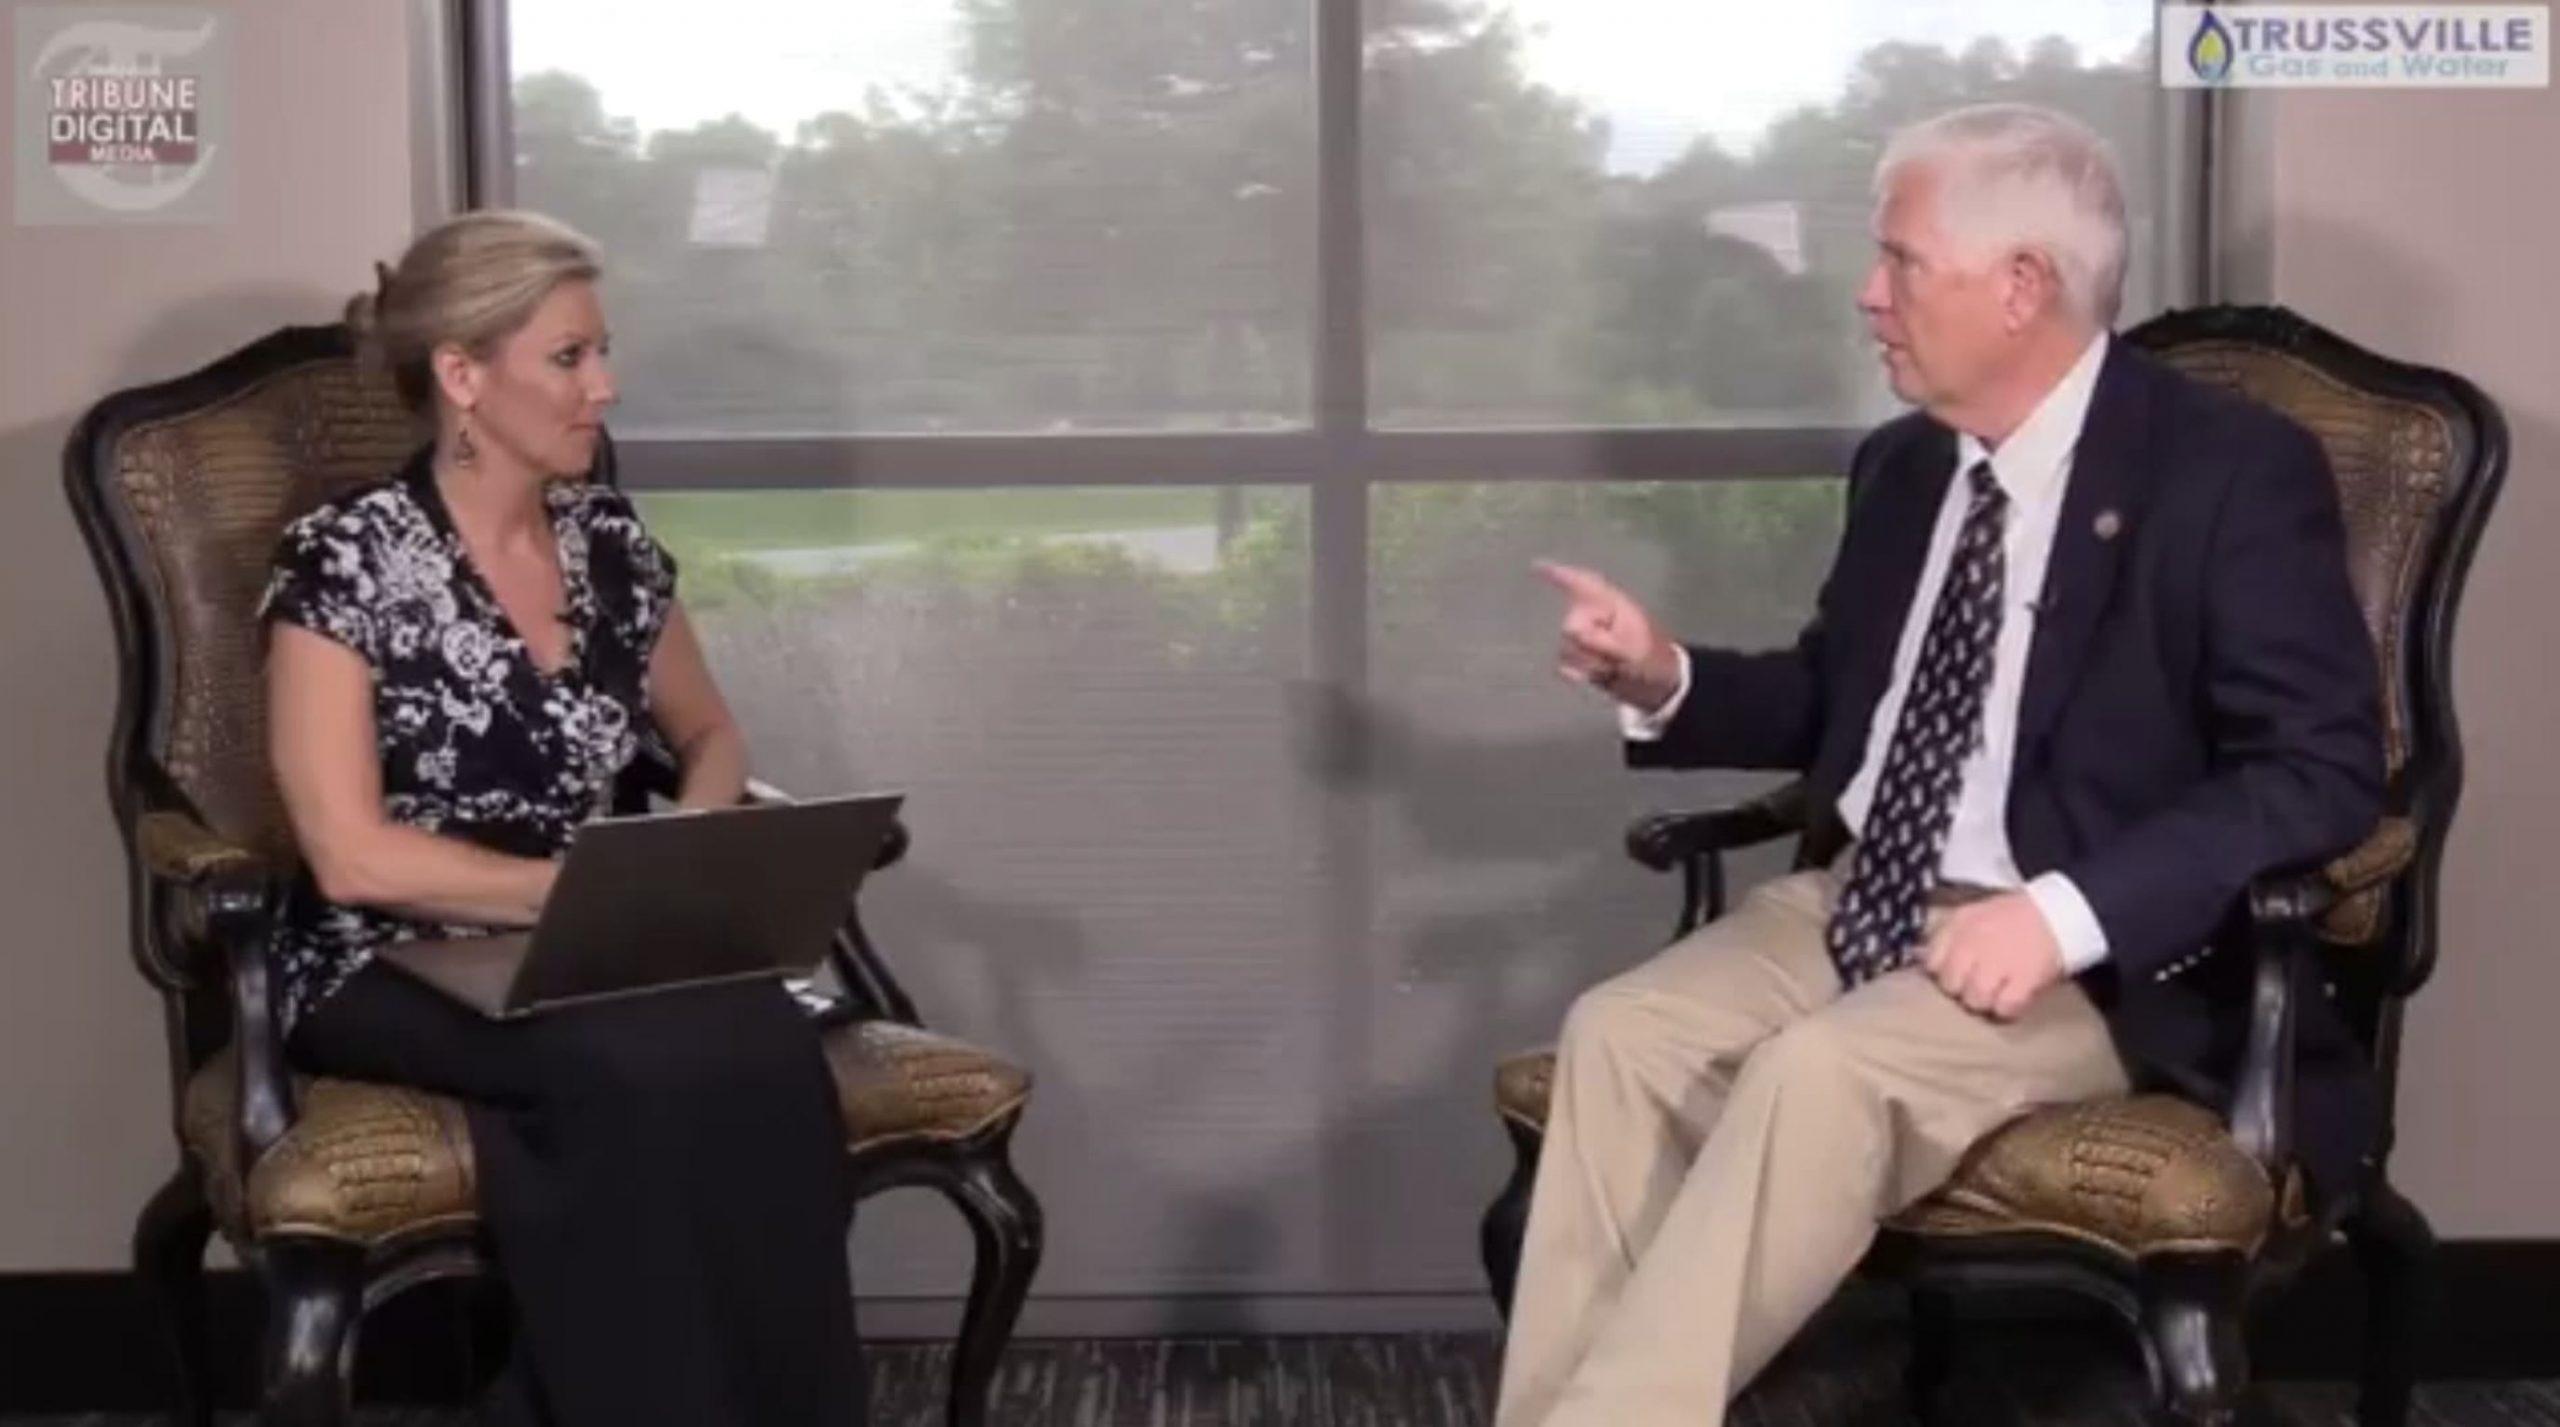 Mo Brooks in Trussville to talk Senate run, calls CNN report 'unadulterated bovine excrement'